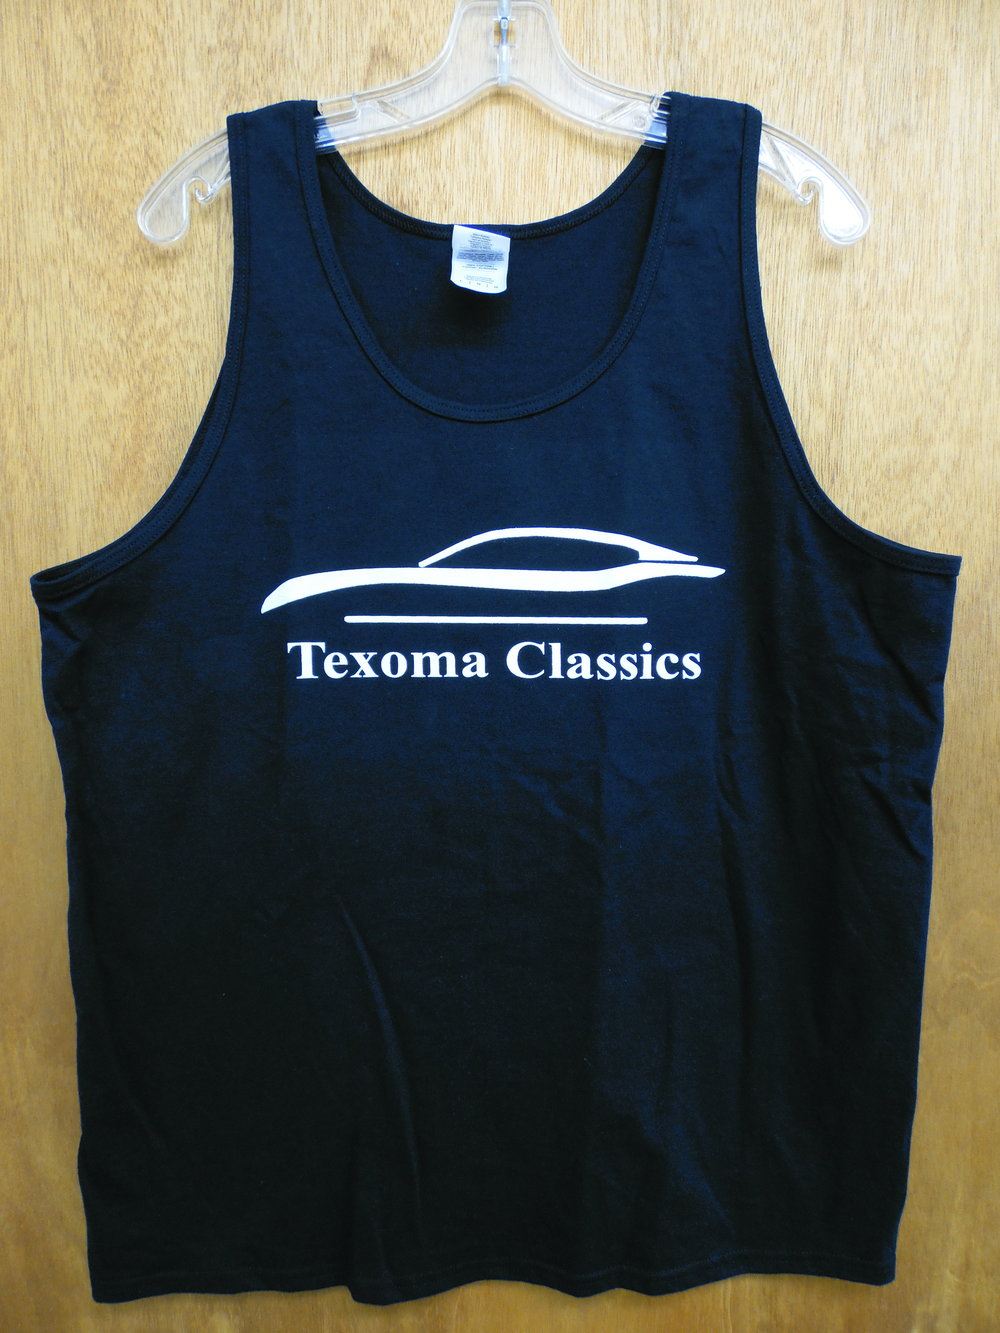 Texoma Classics Mens Tanks